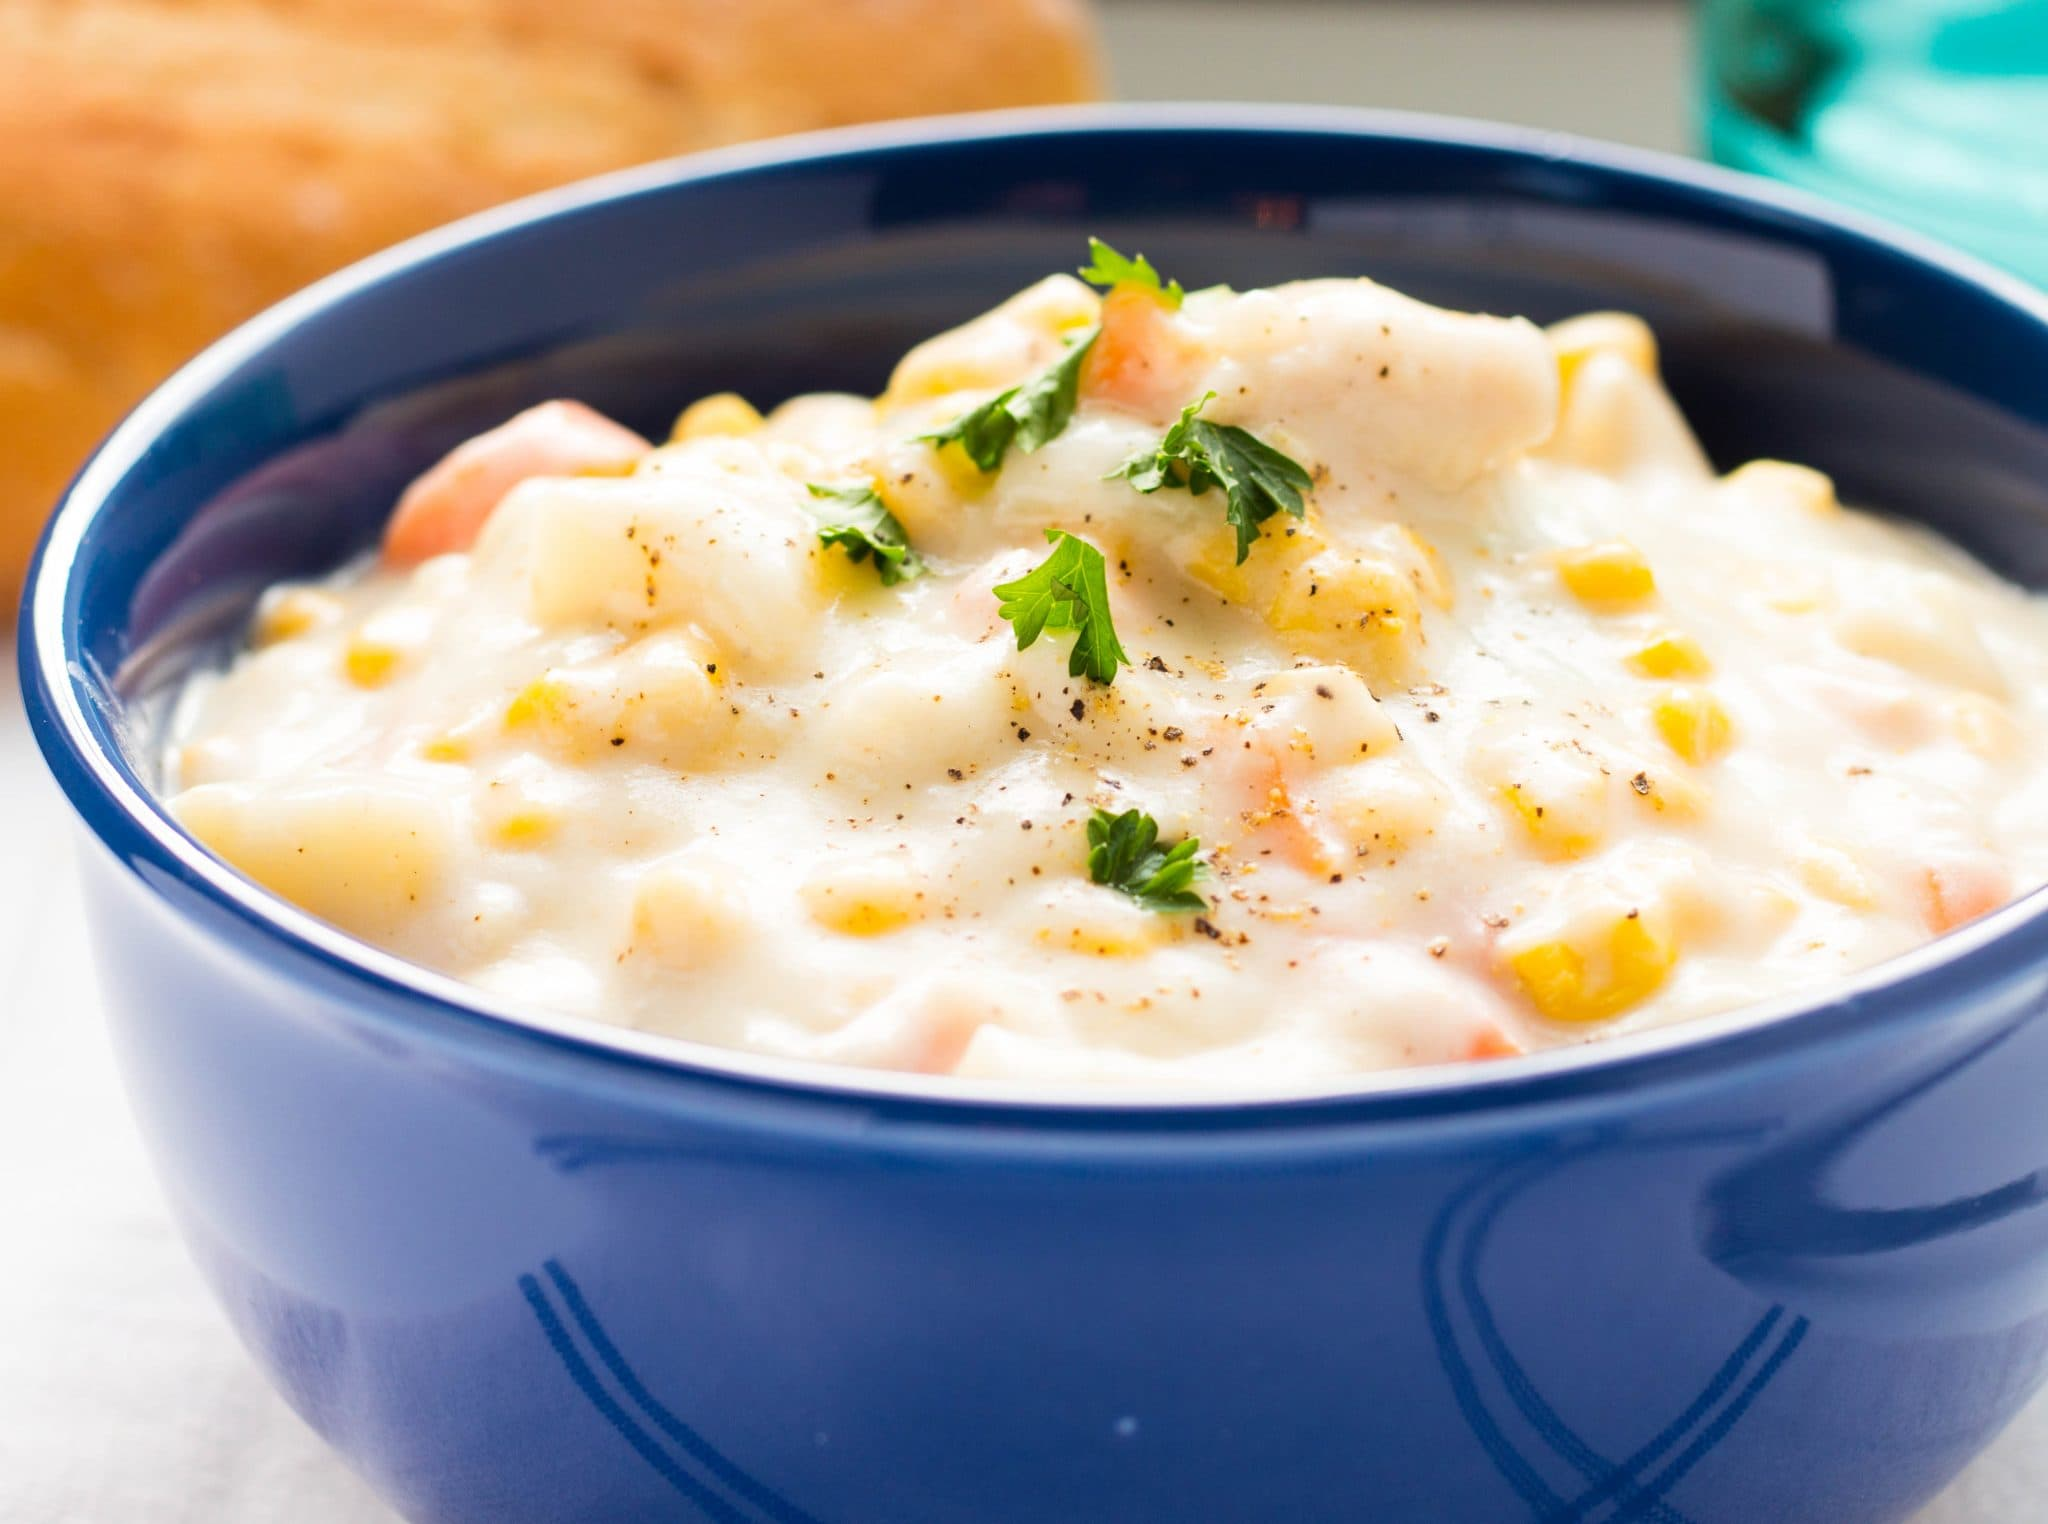 One Pot Creamy Chicken Corn Chowder